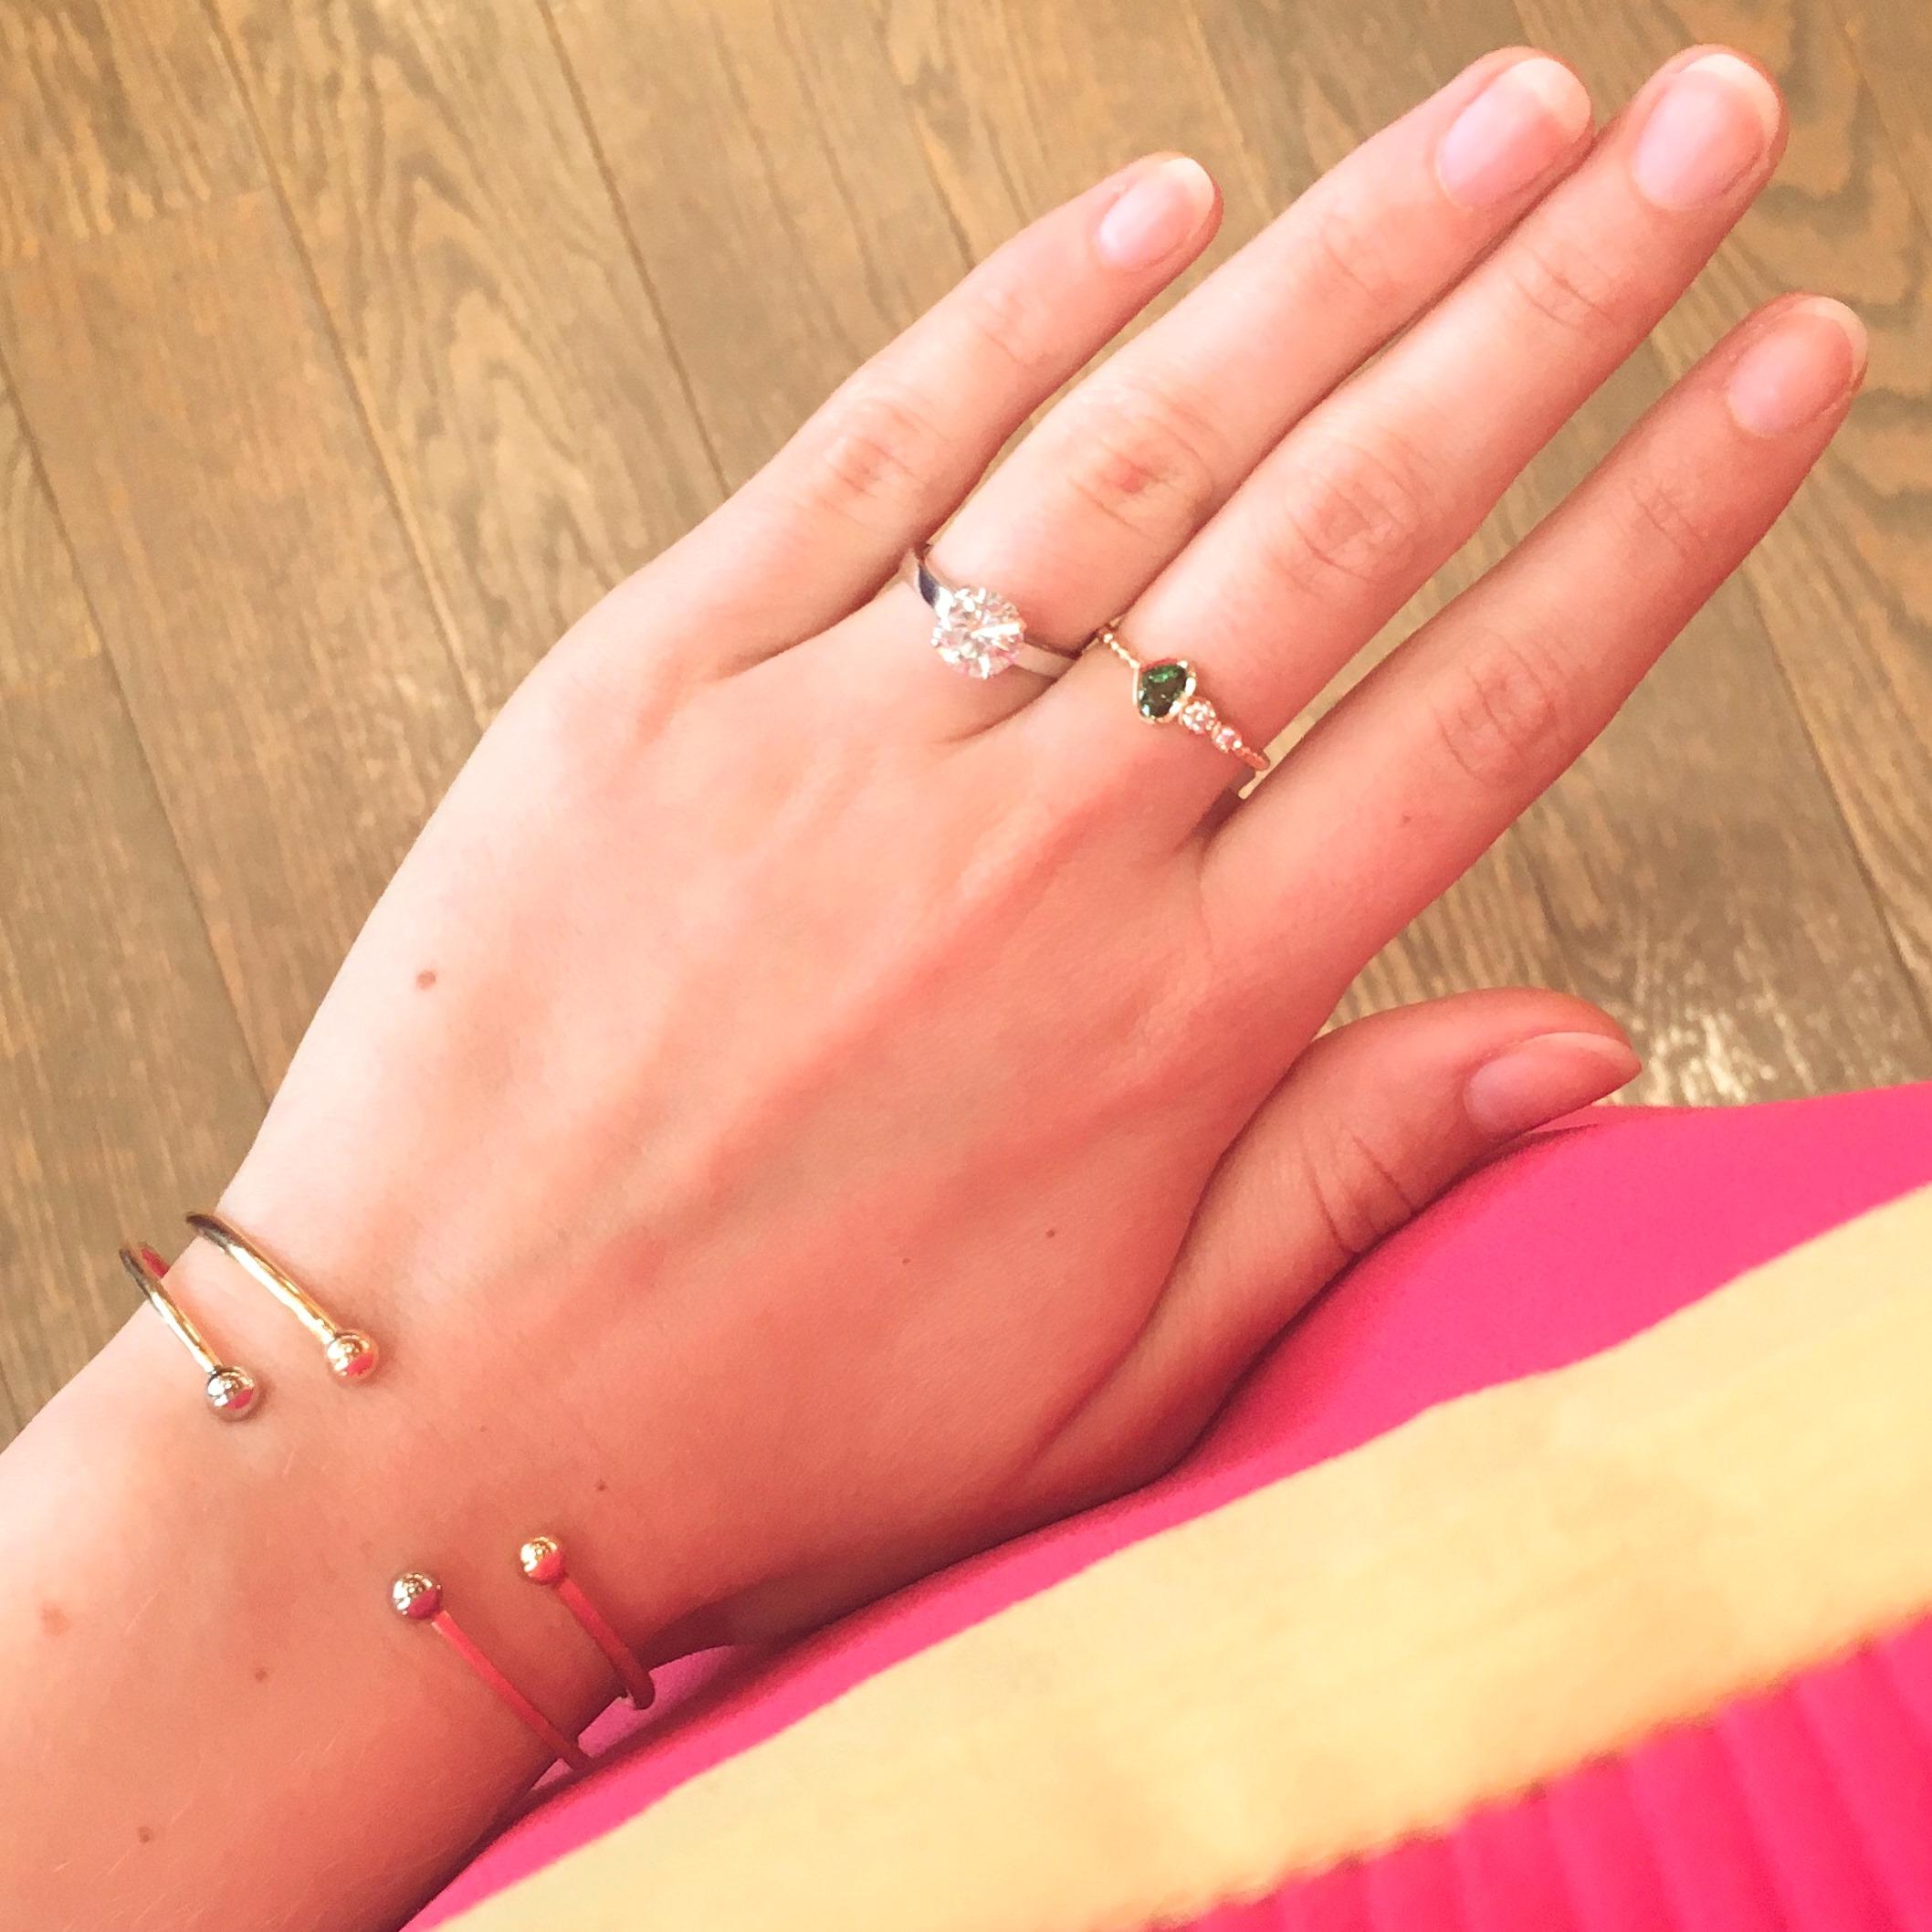 Solitaire diamant de 1.52ct G-SI1 or blanc 15600€. Bague grenat tsavorite et diamants or rose 18K 745€. Jonc or jaune et perles or roses 9g 895€ (vendu). Jonc or jaune et perles or blanc 6.50g 695€